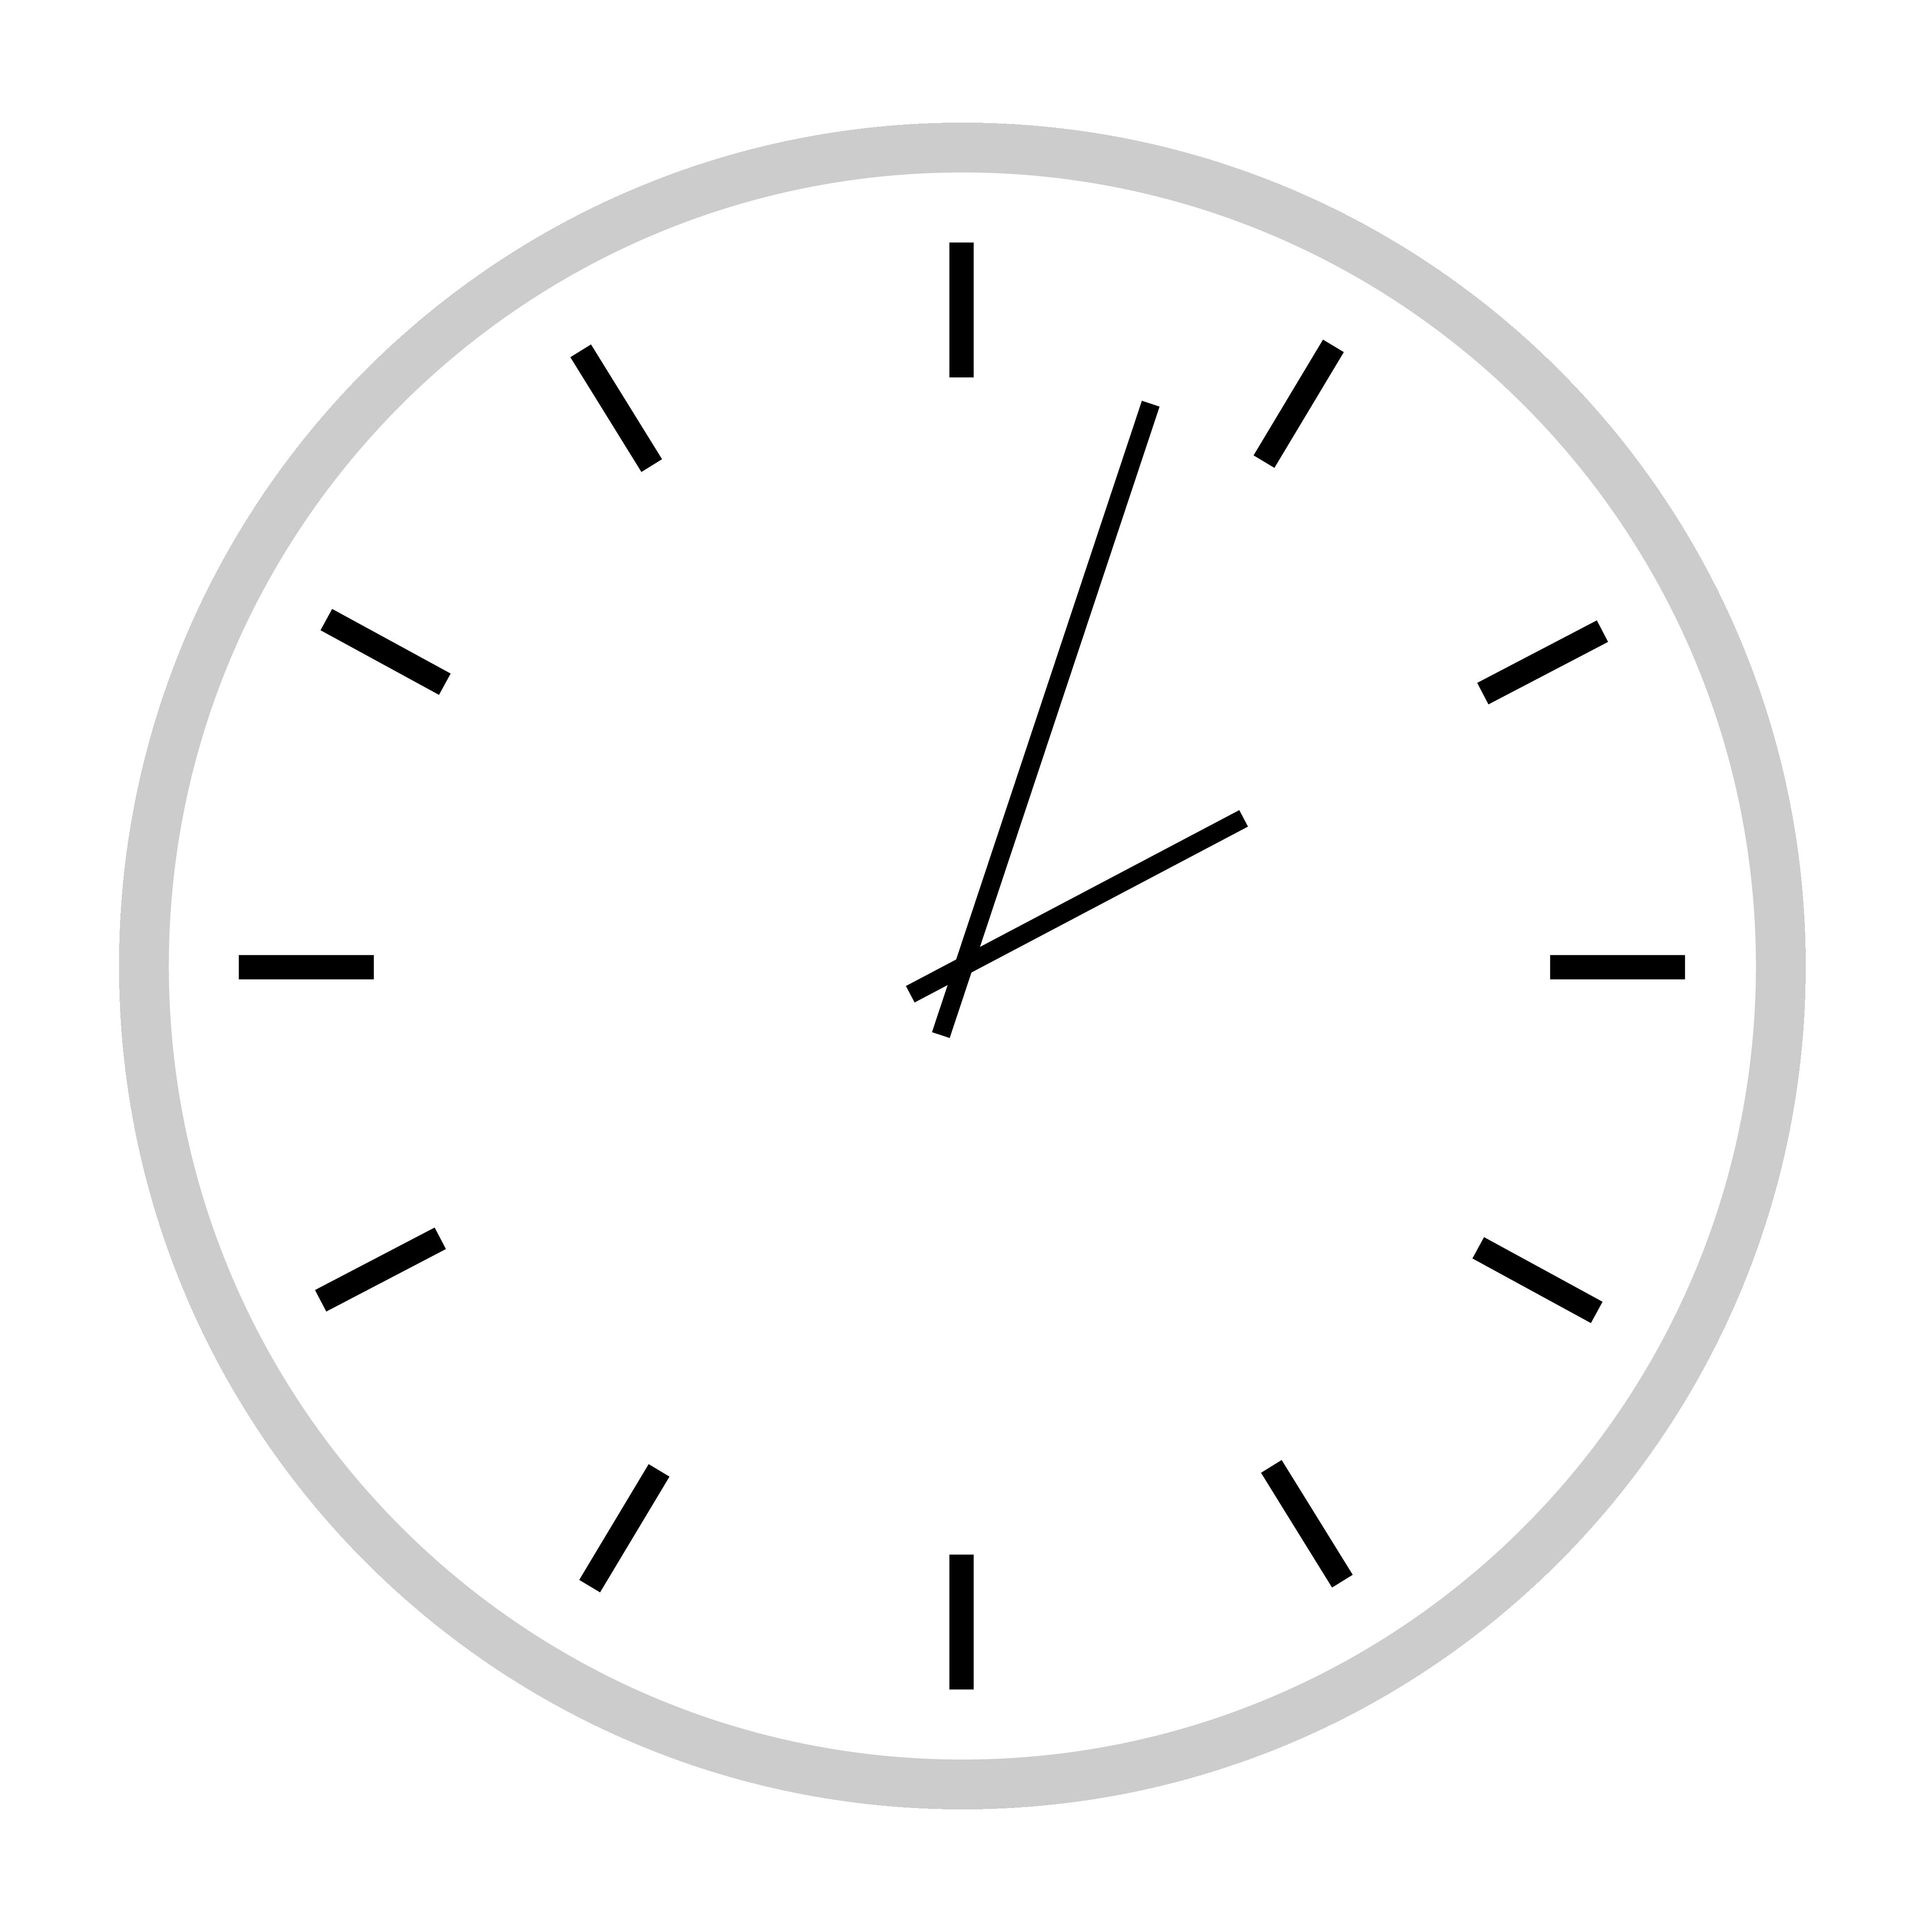 Clocks-Time-01.png